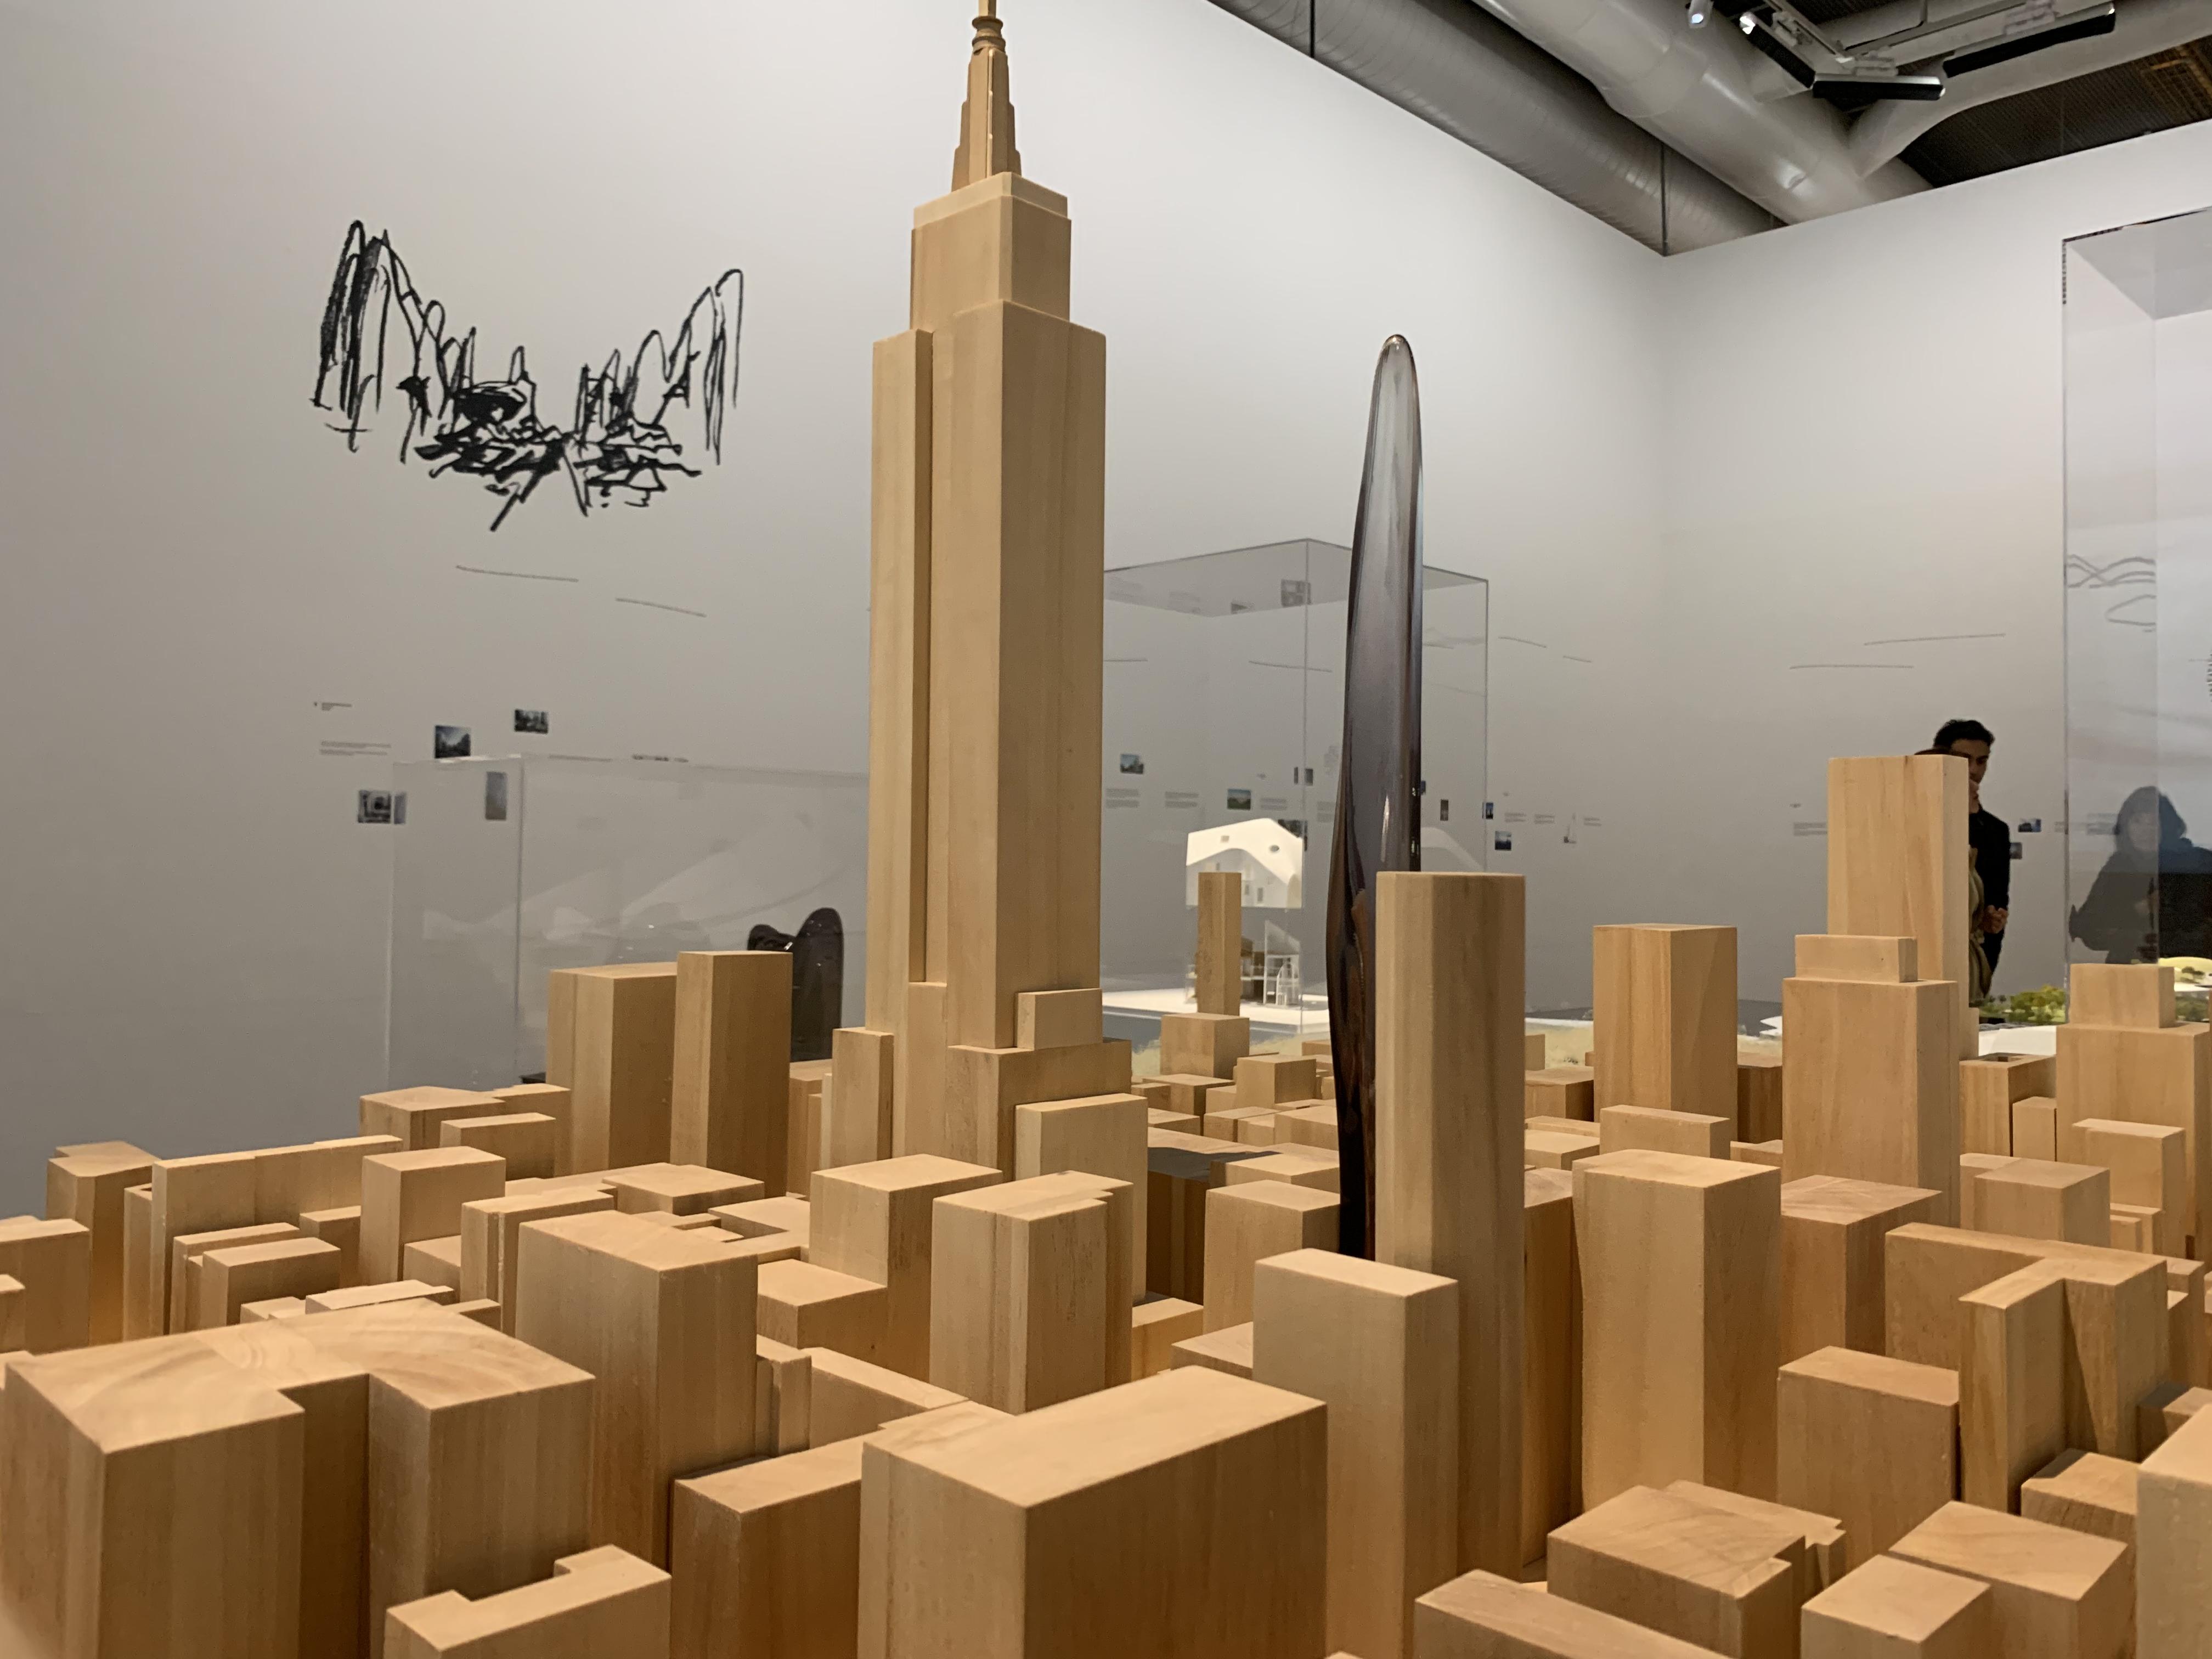 07_MAD_MADX Centre Pompidou